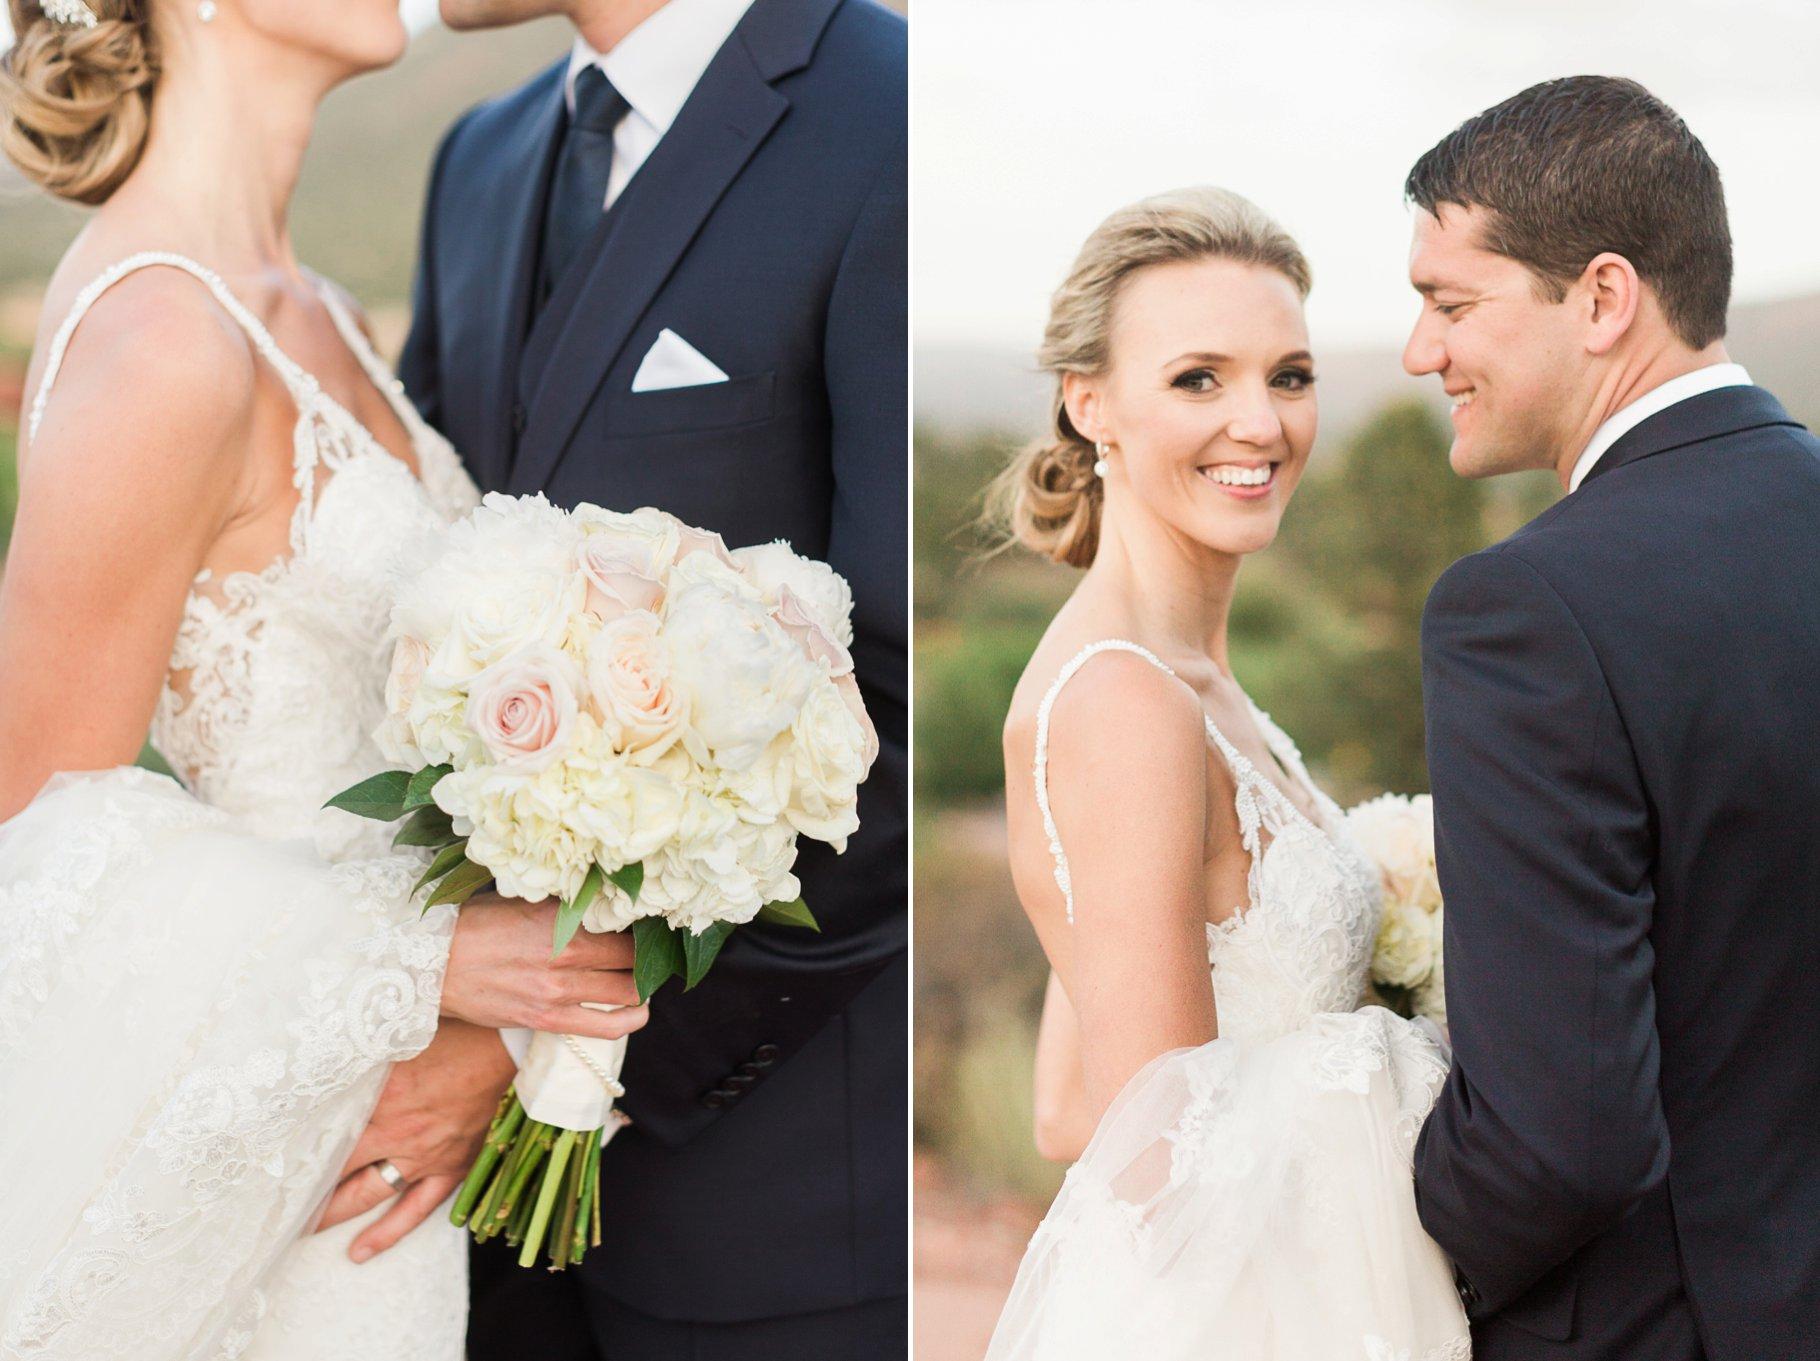 sedona wedding-114_GRETCHEN WAKEMAN PHOTOGRAPHY.jpg